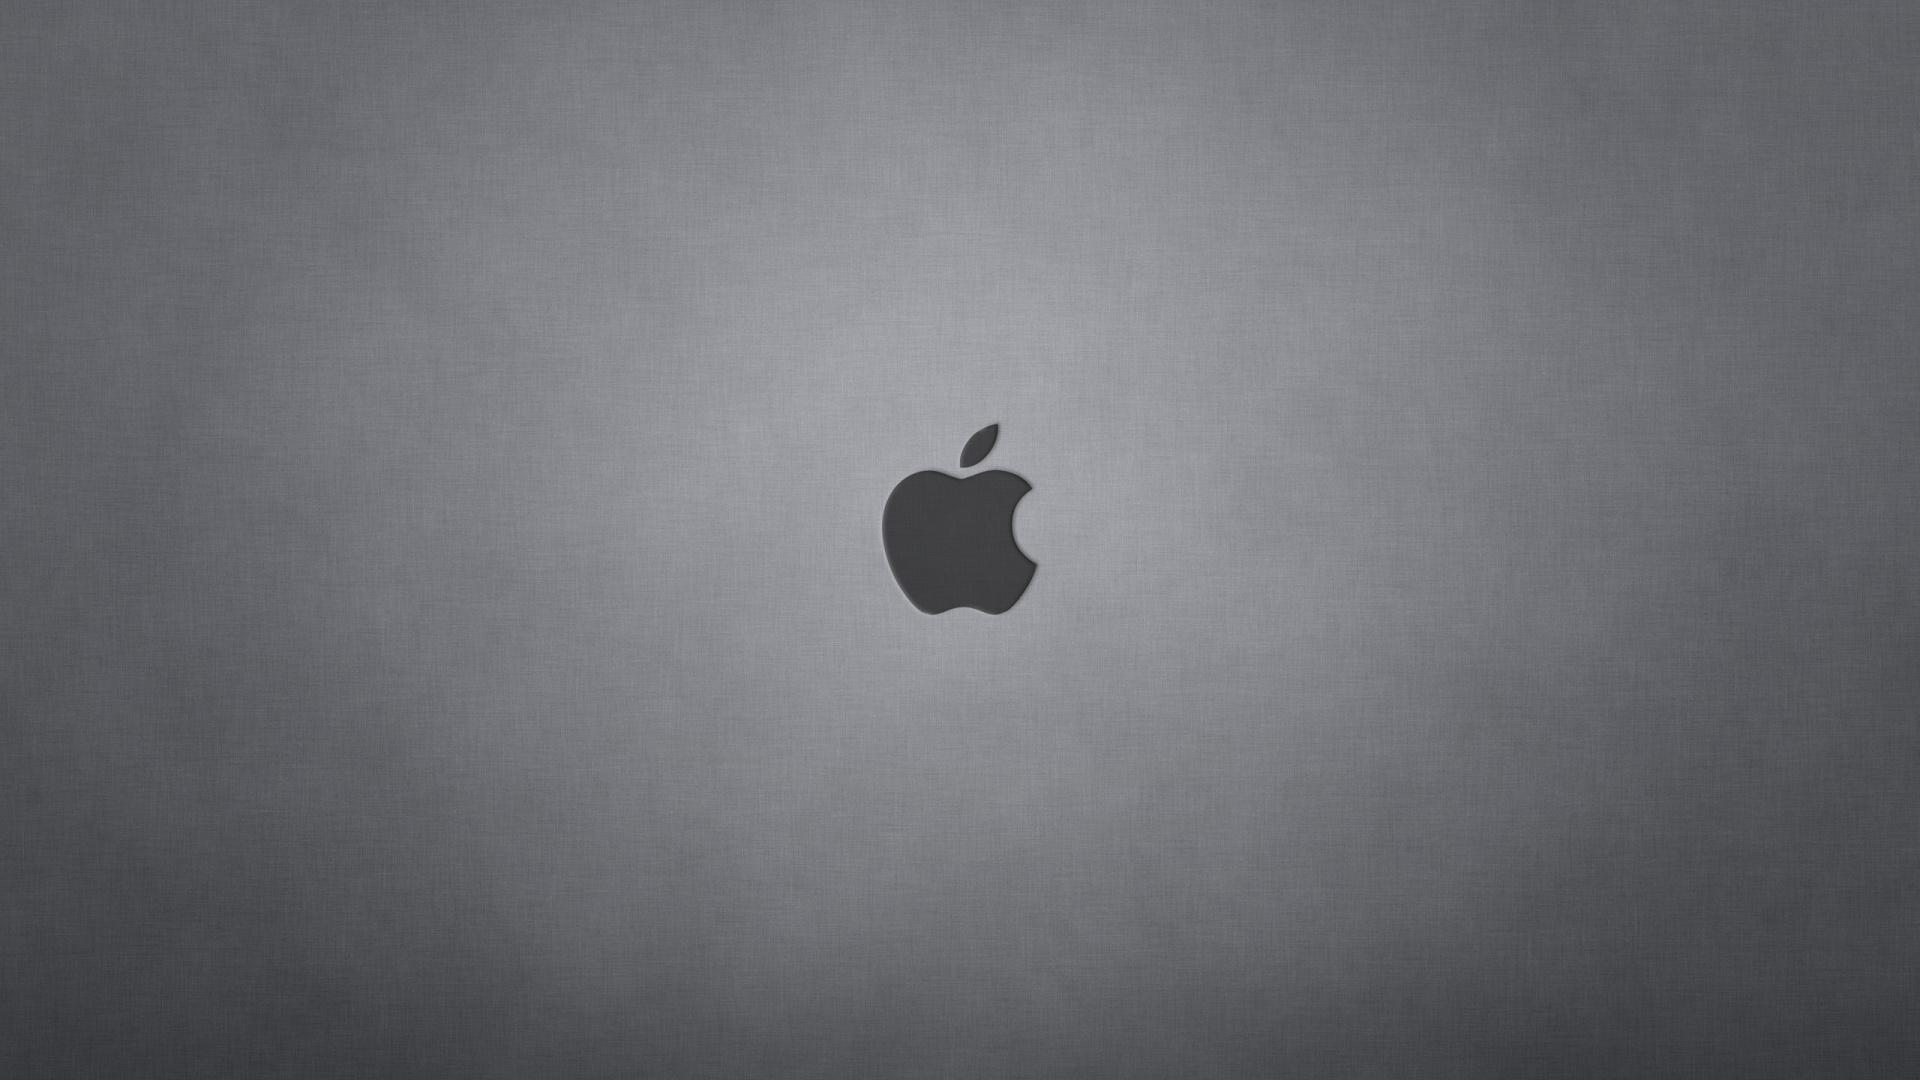 HD Wallpapers Mac